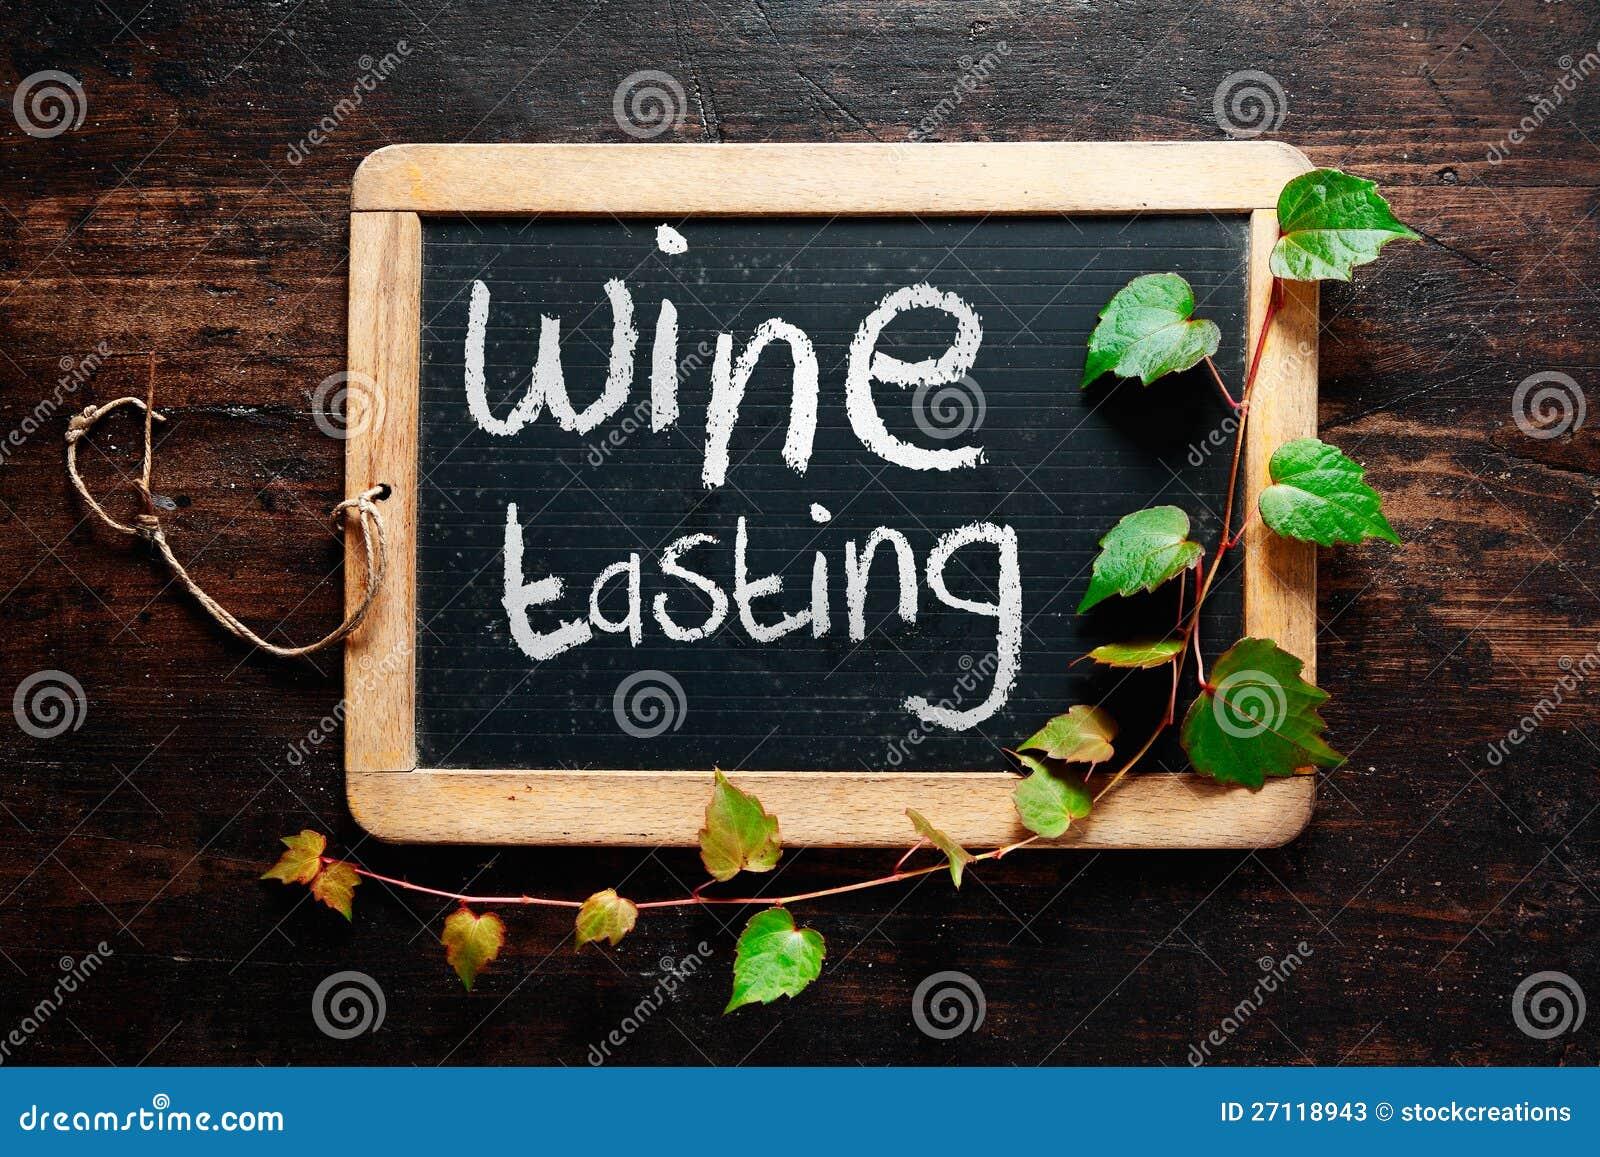 handwritten decorative wine tasting sign stock photos   image 27118943